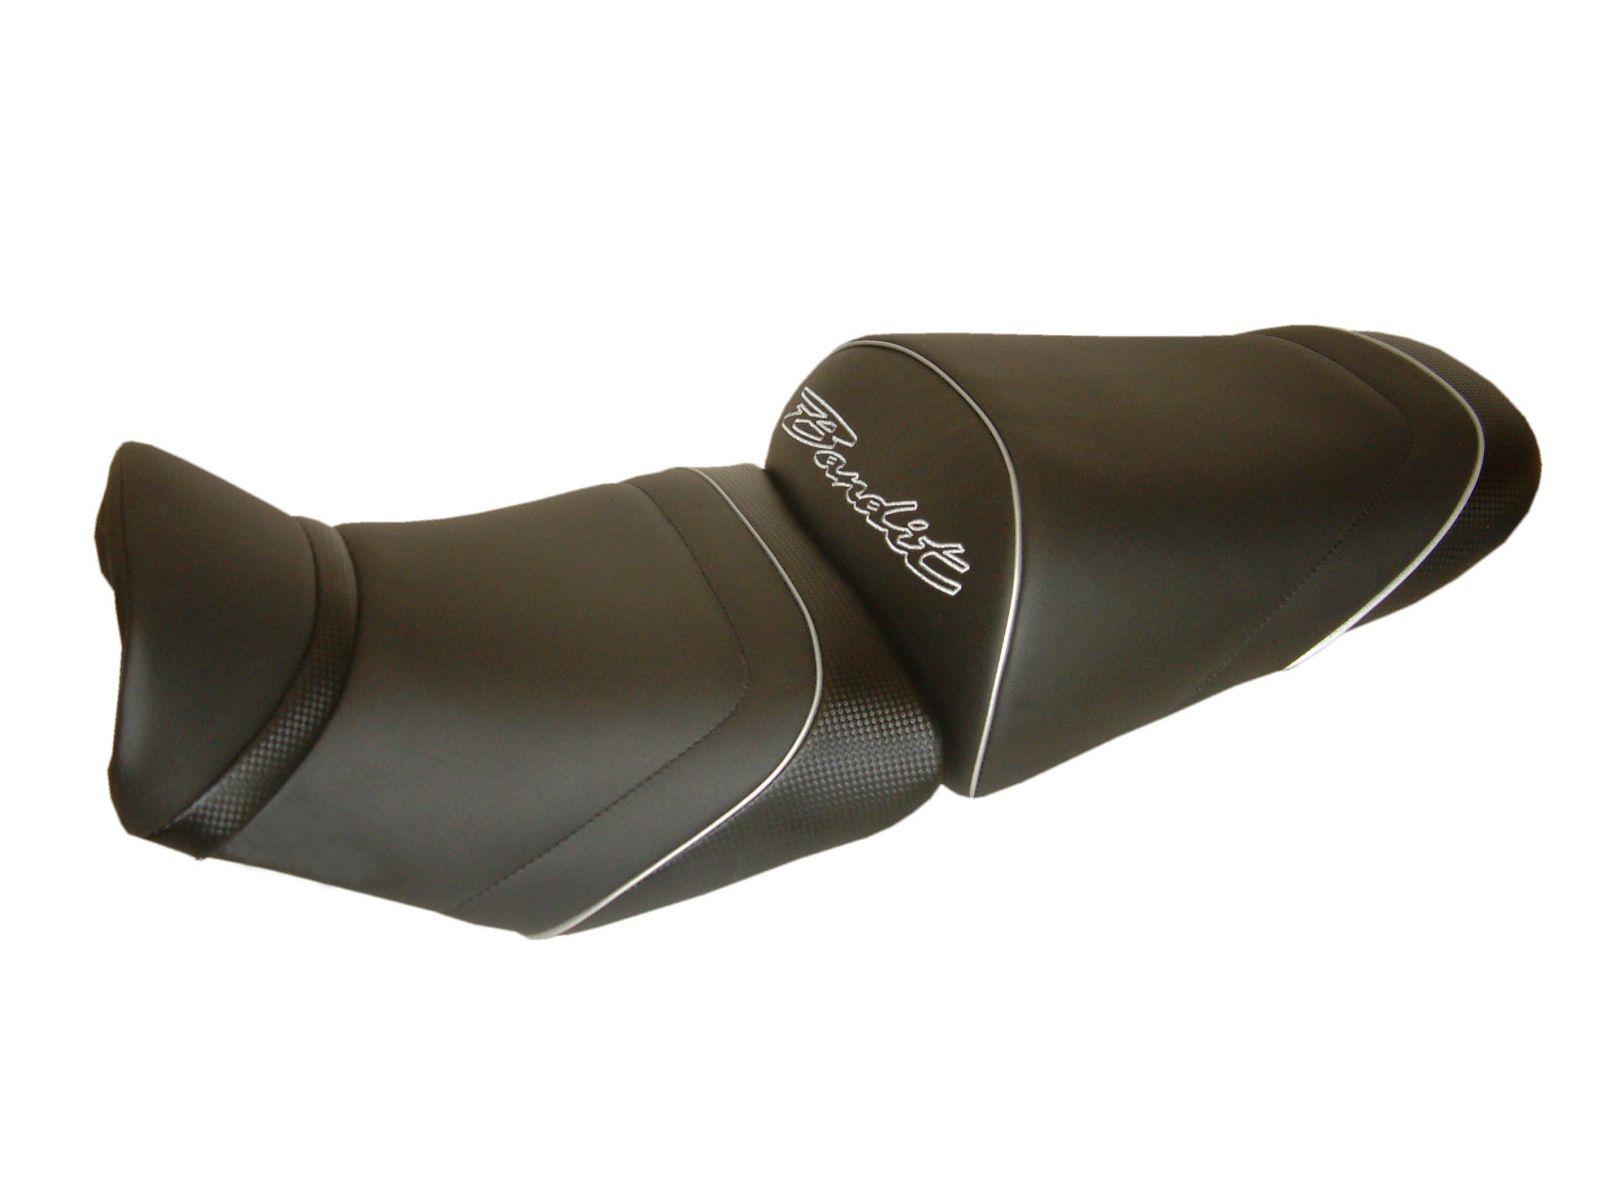 selle grand confort sgc4196 suzuki bandit 650 2010 tarifs pour france. Black Bedroom Furniture Sets. Home Design Ideas